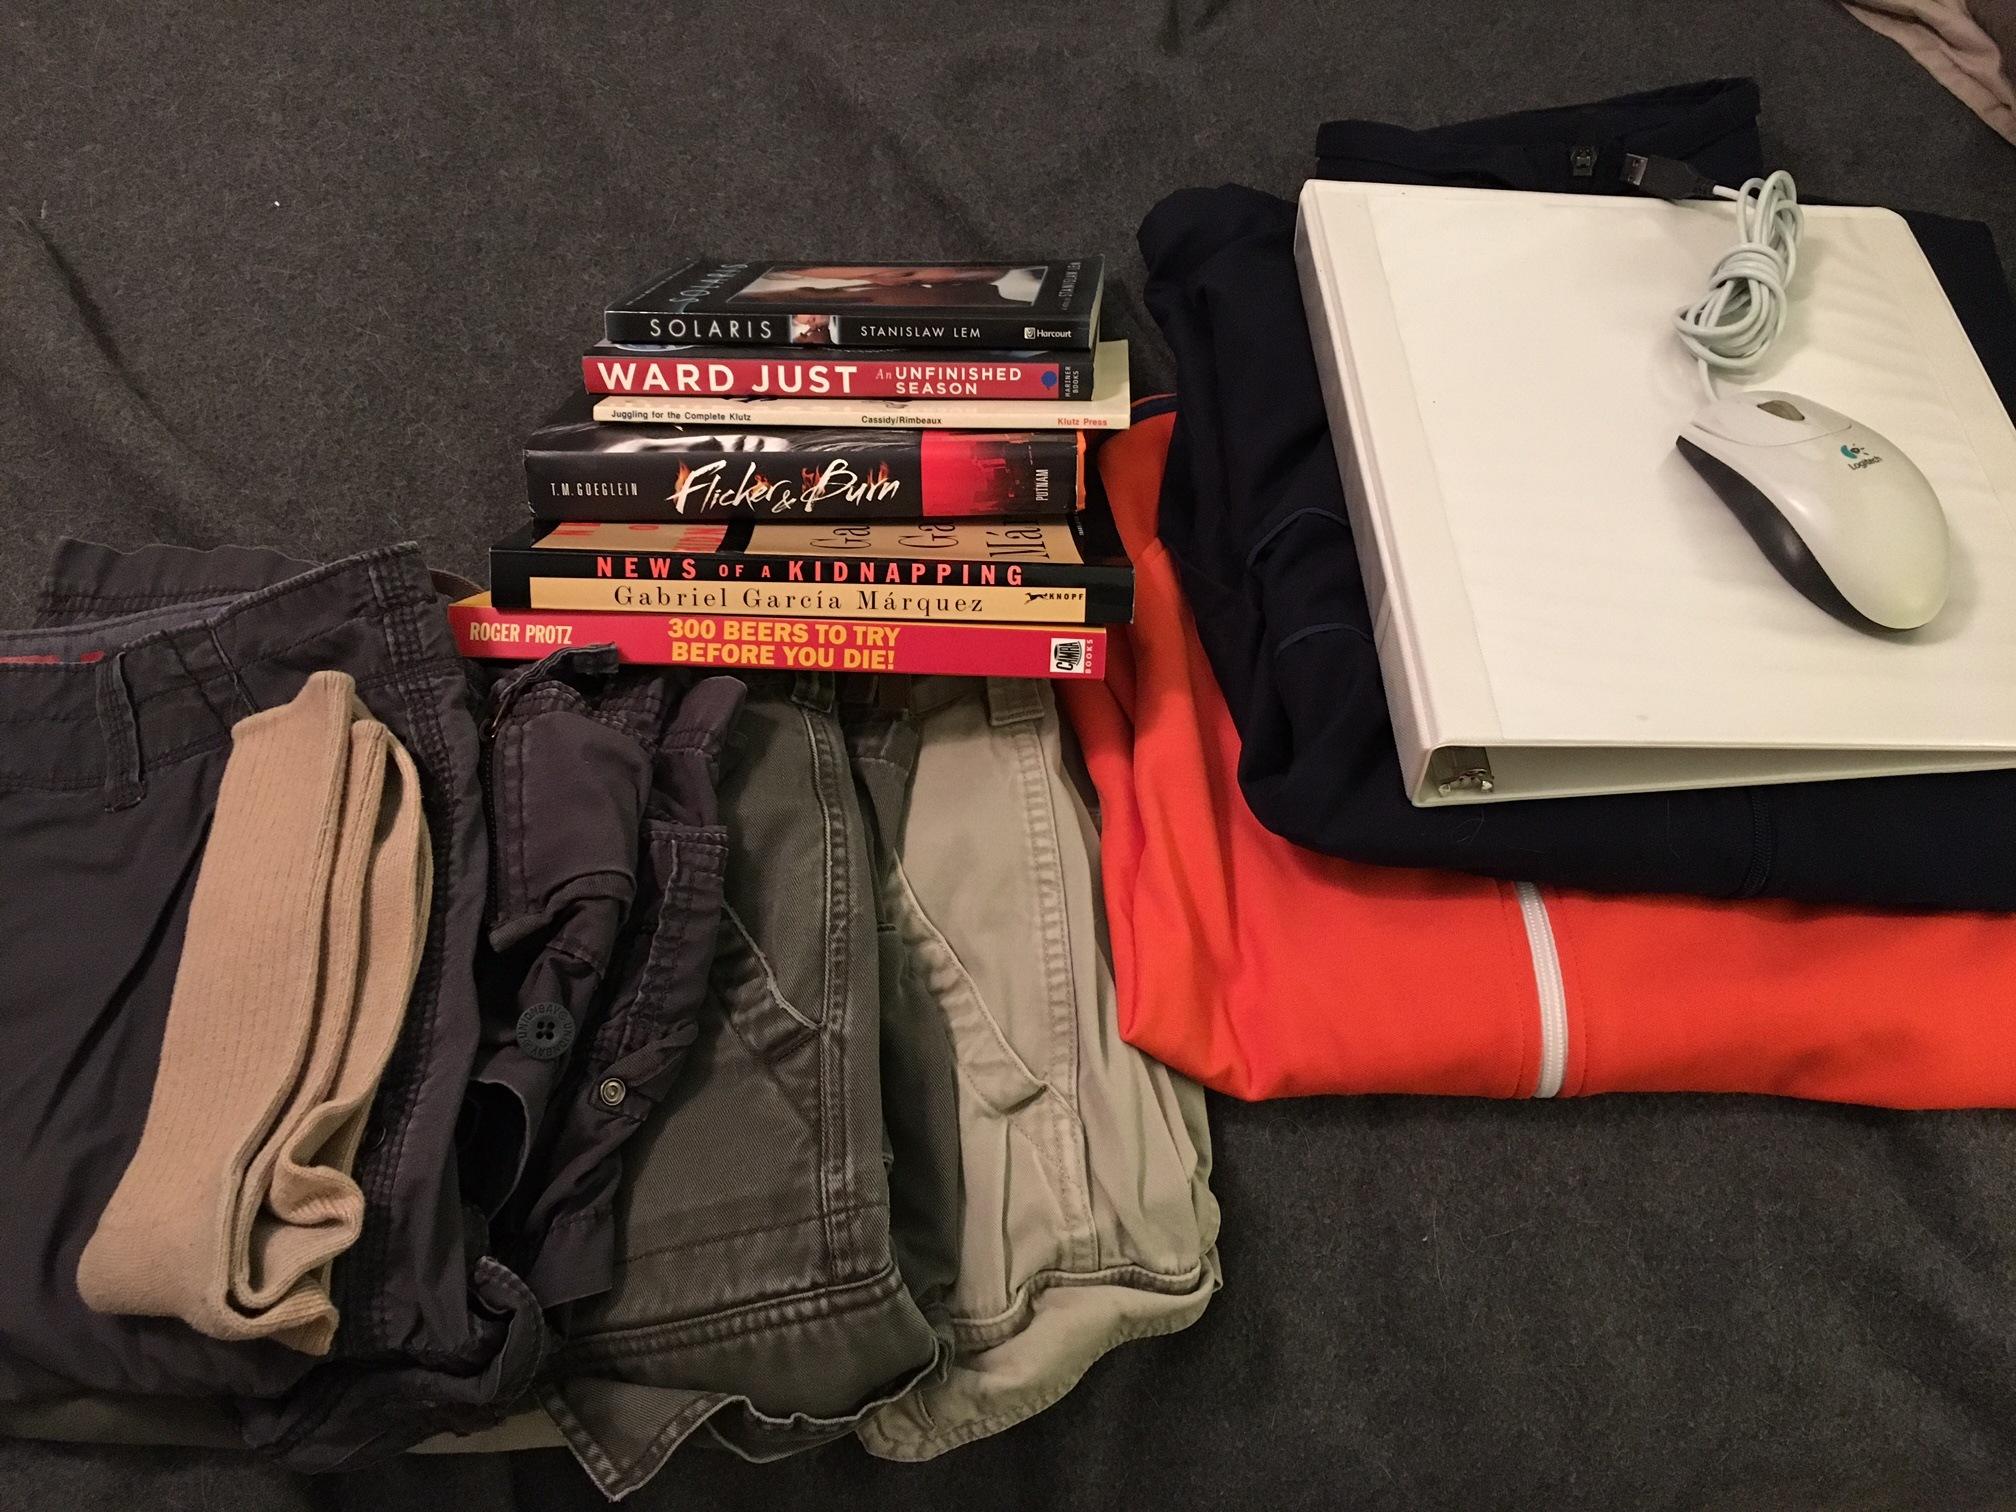 cargo shorts, a few books